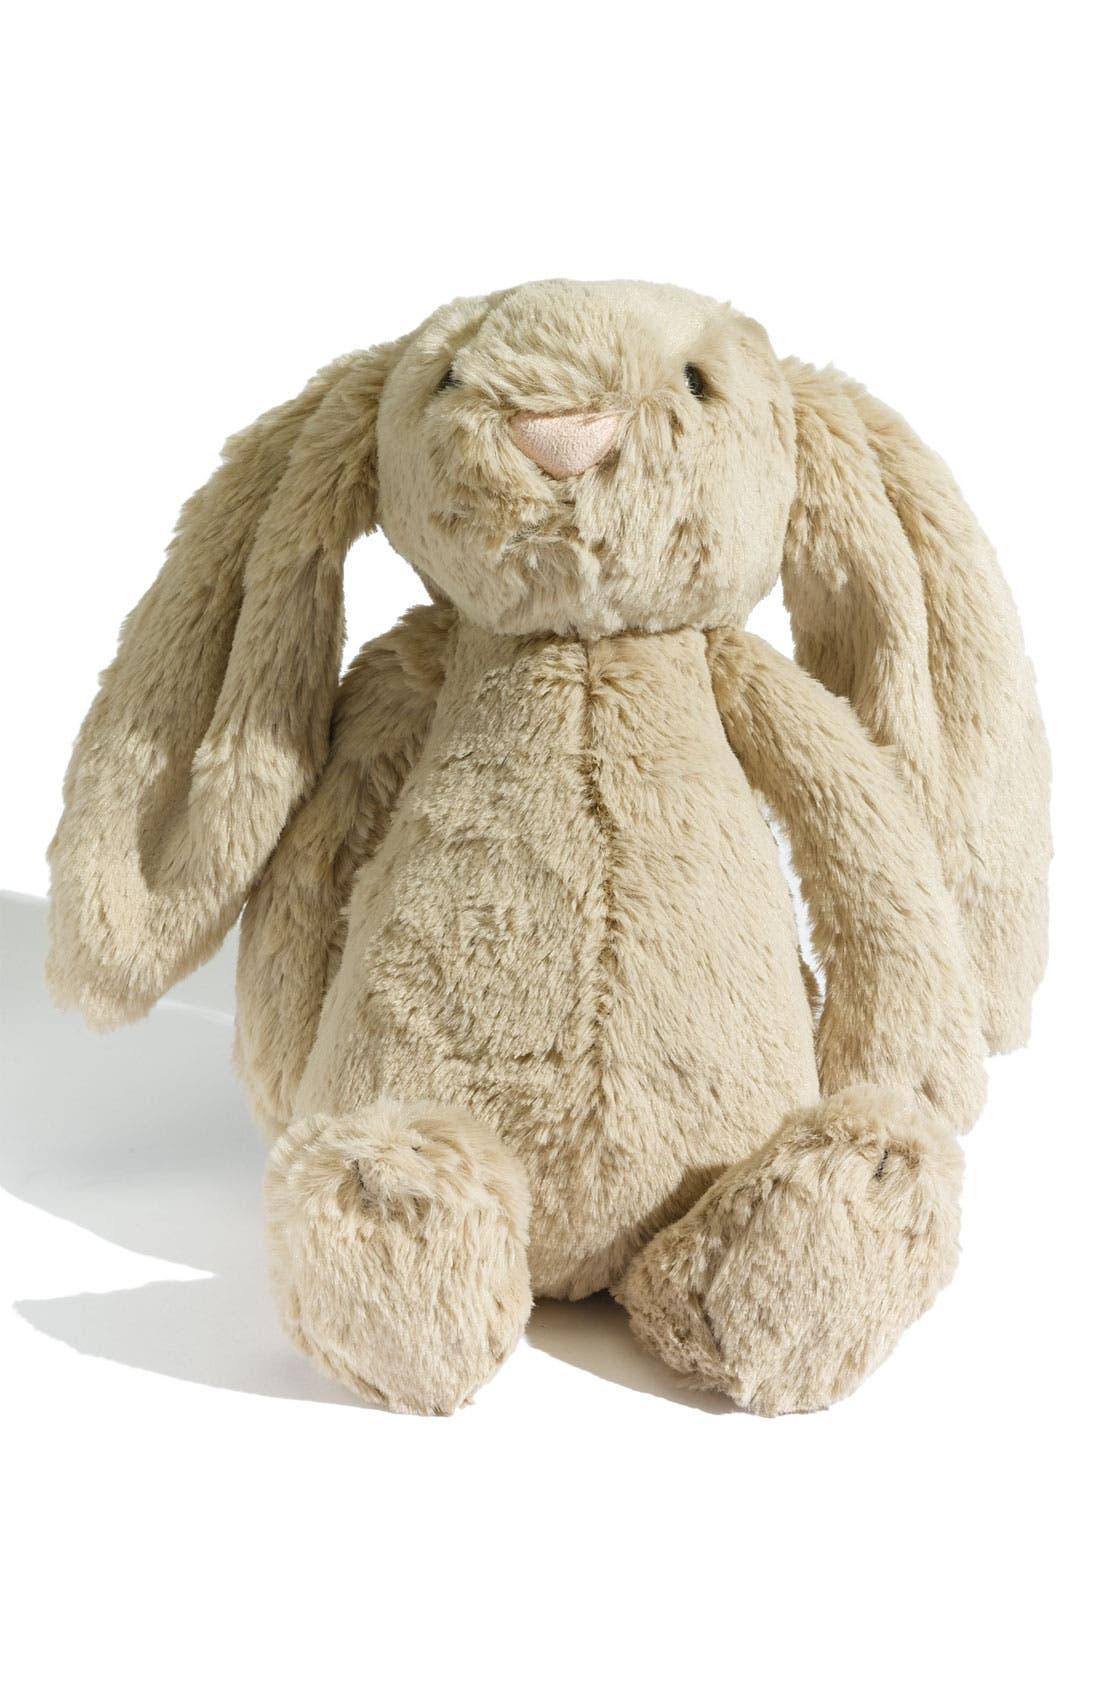 Main Image - Jellycat 'Bashful' Bunny